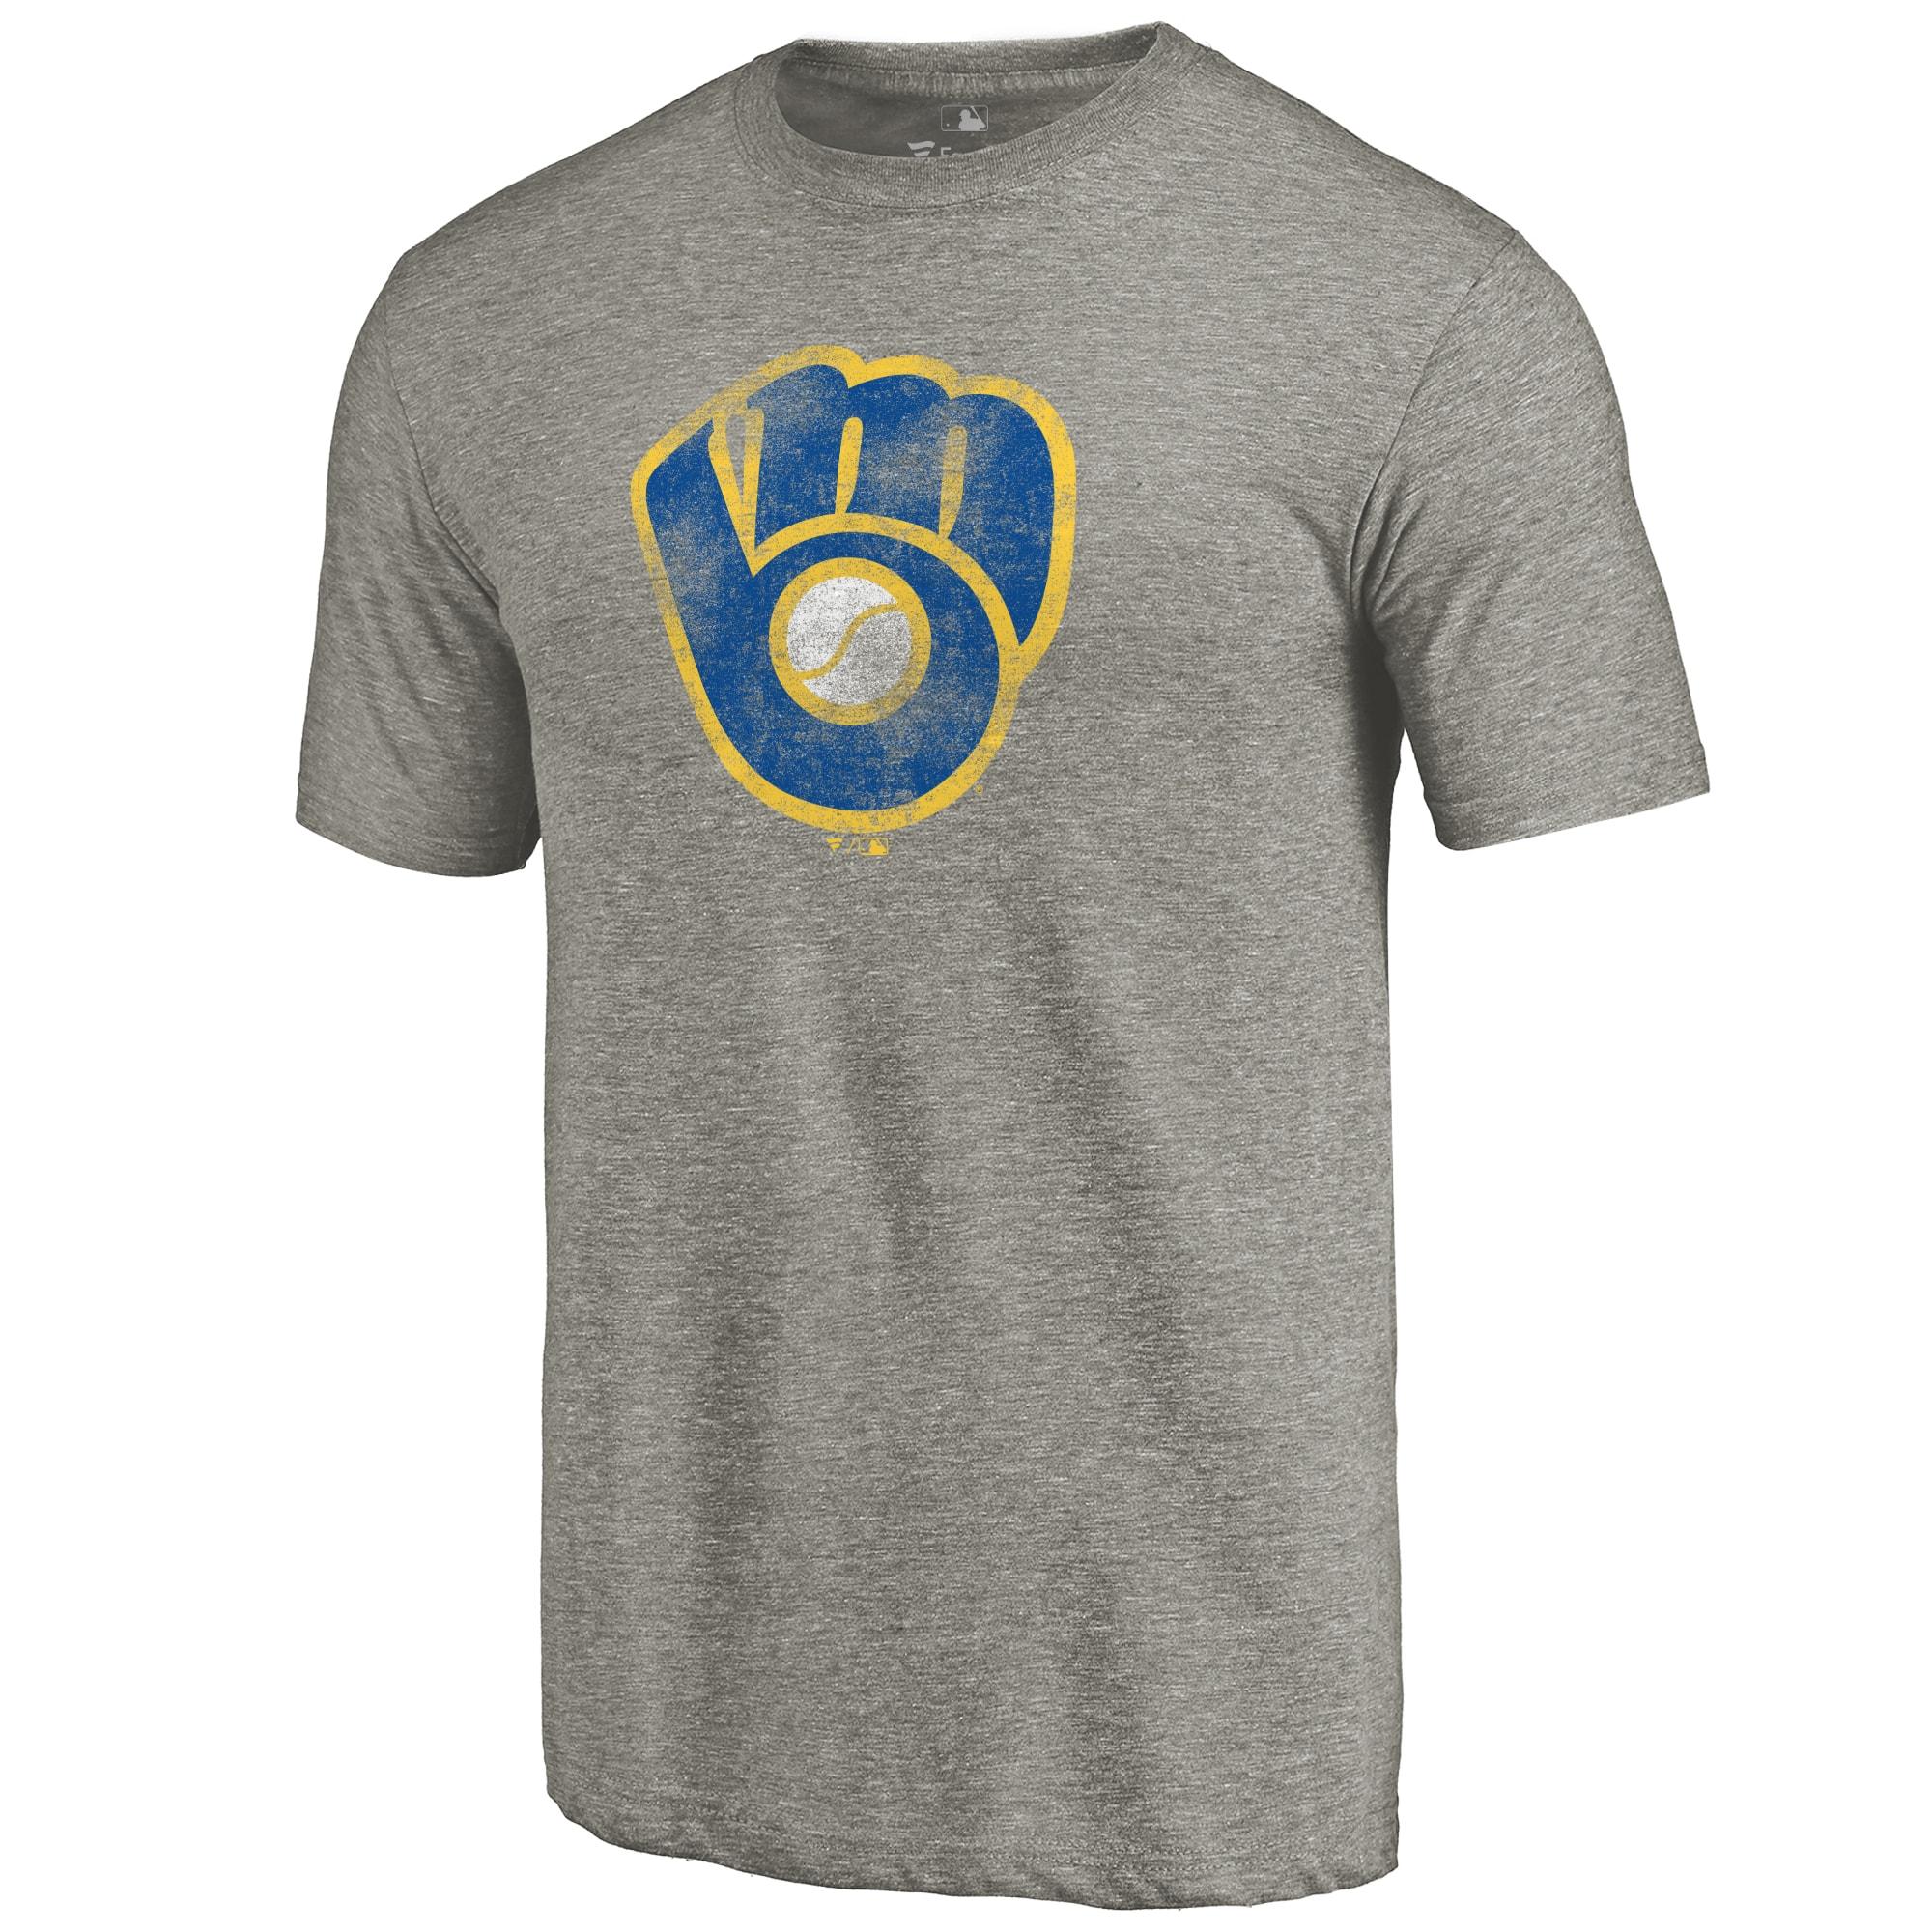 Milwaukee Brewers Distressed Team Tri-Blend T-Shirt - Ash